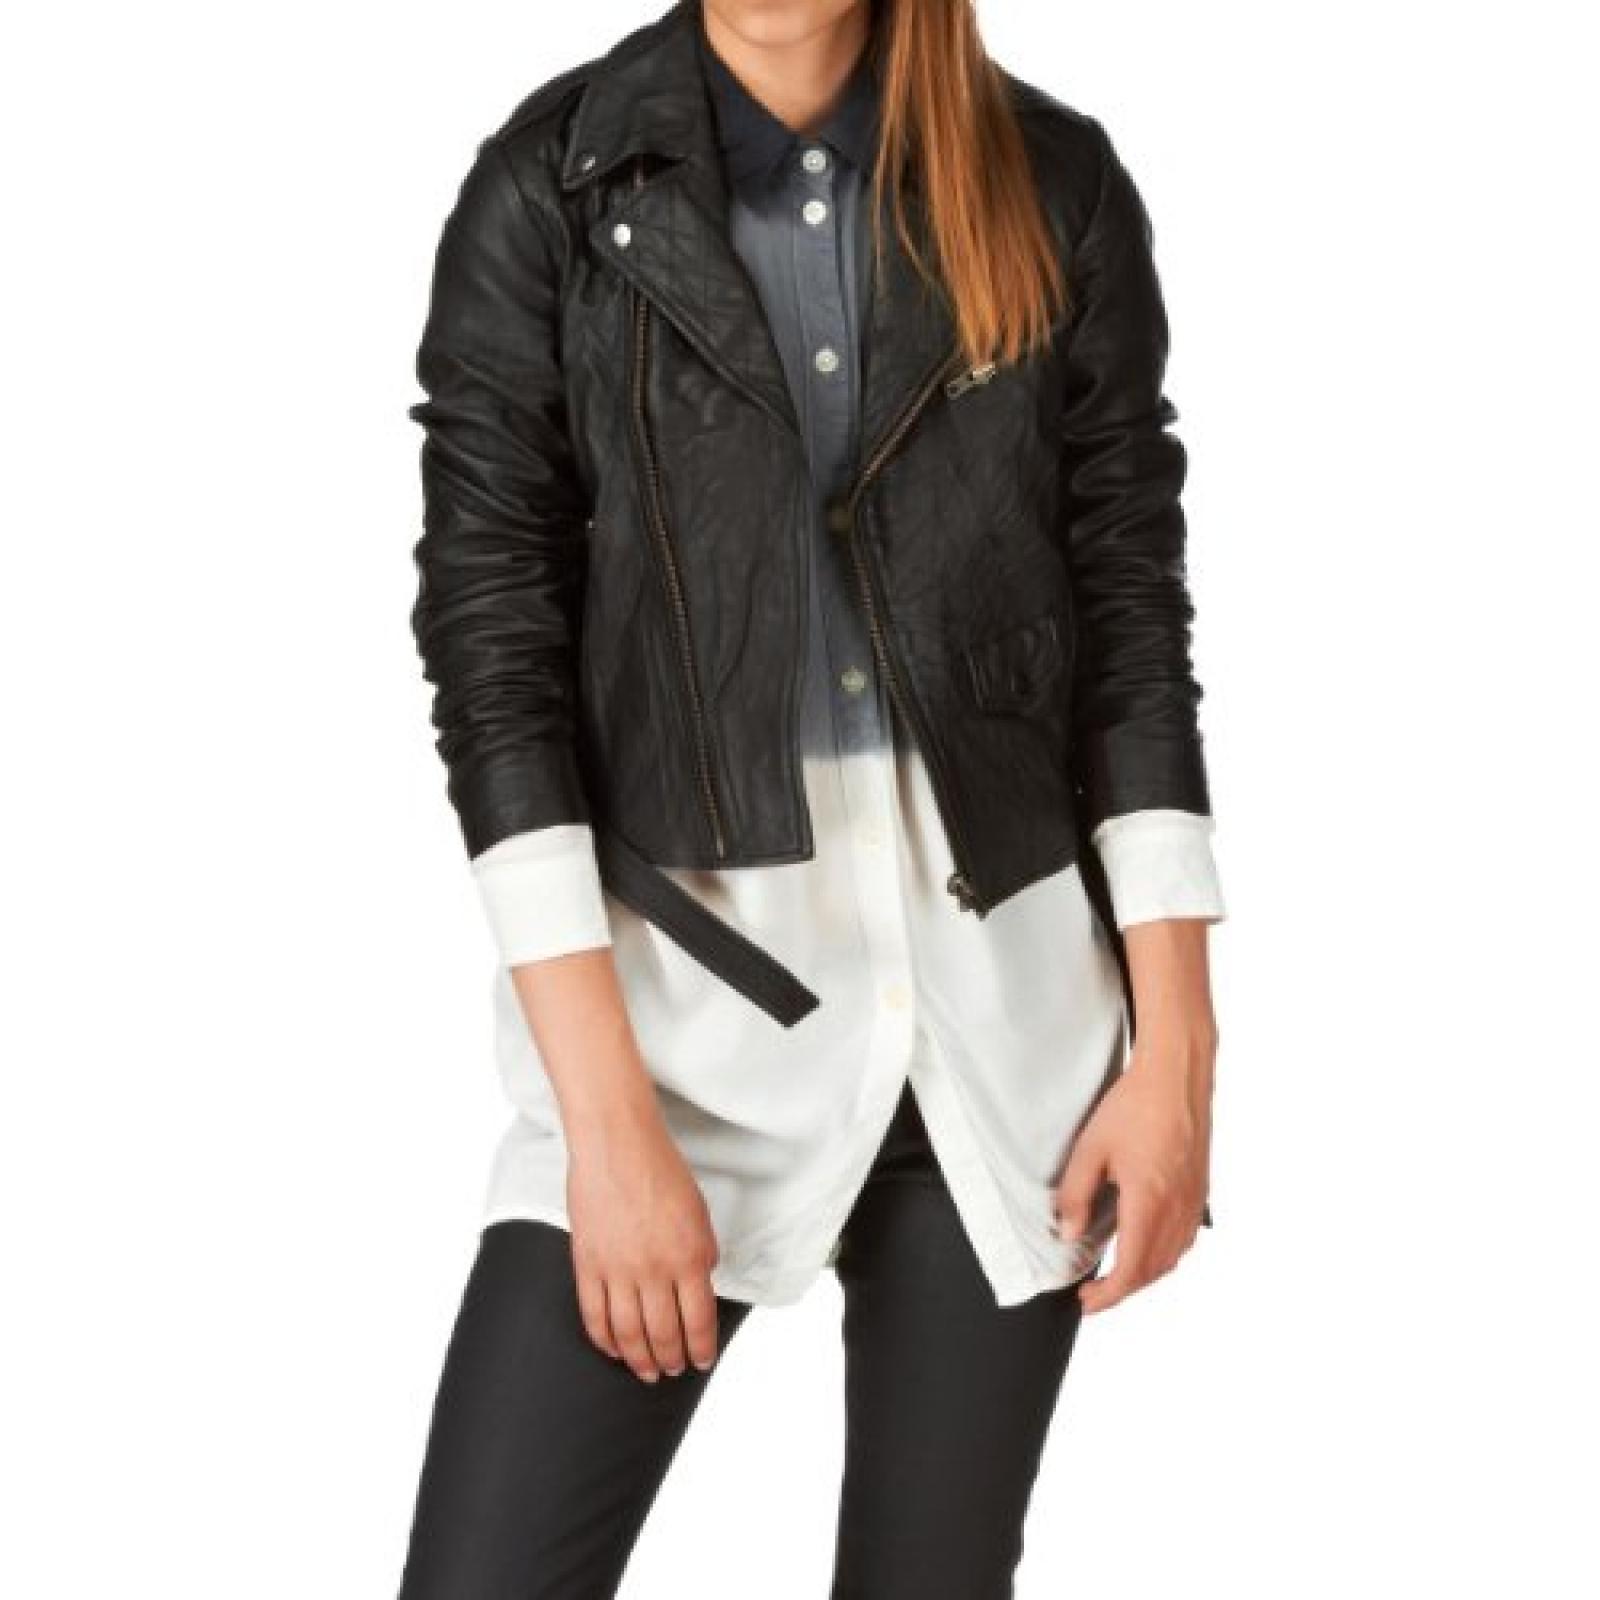 Religion Hooper Leather Jacket - Black